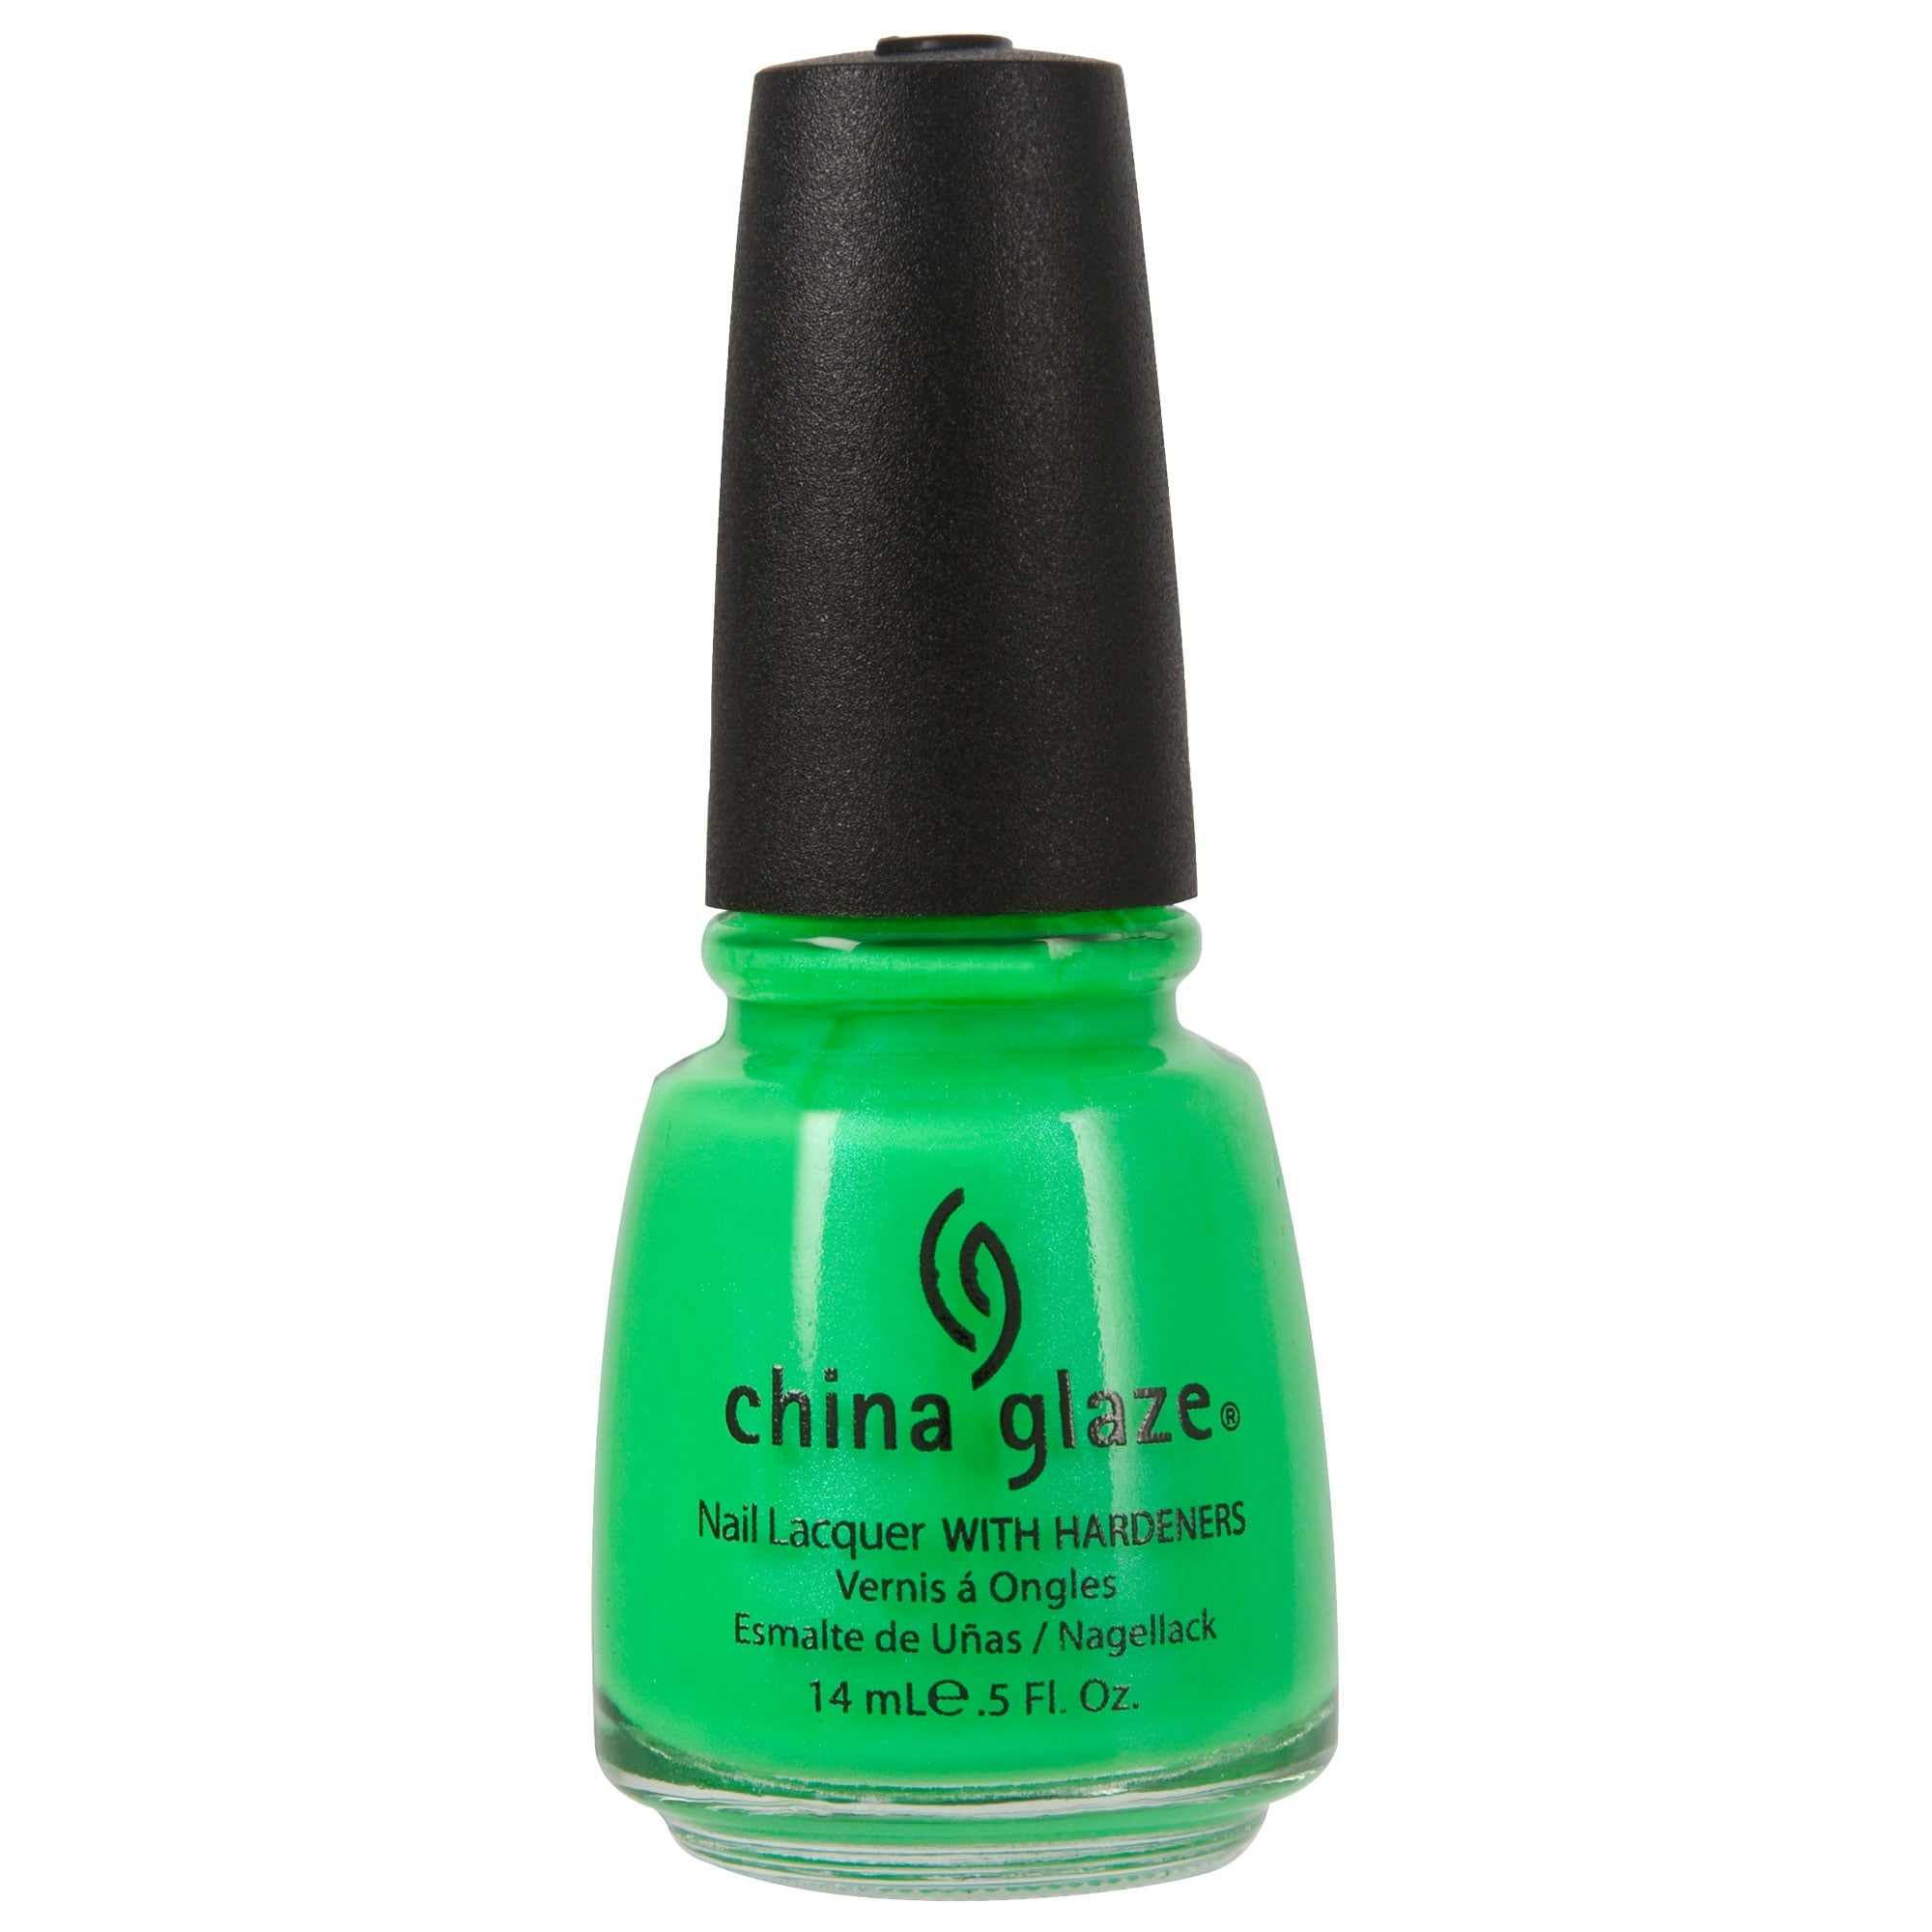 China Glaze Summer Neons Nail Polish Collection 2012 In